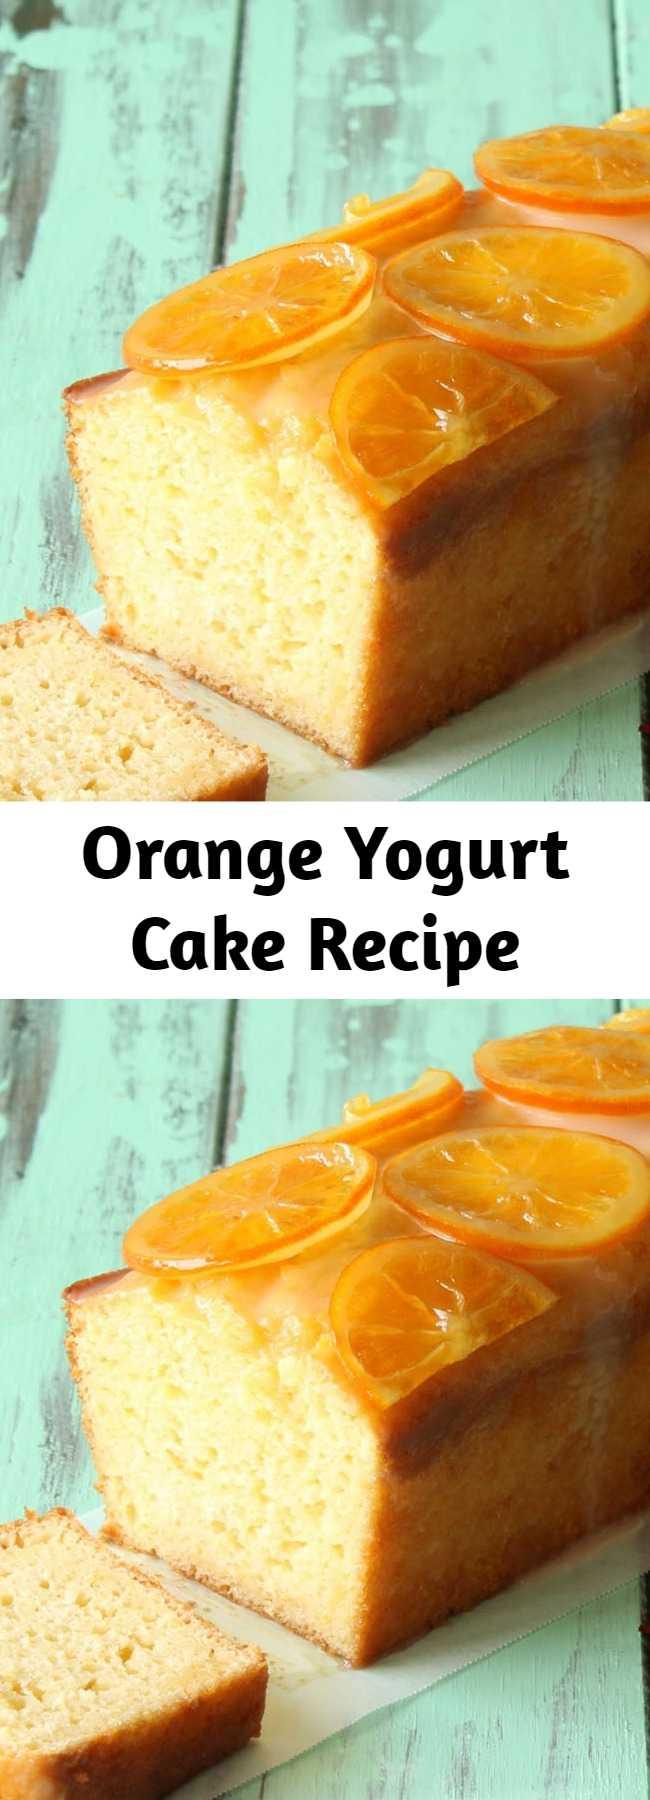 Orange Yogurt Cake Recipe - Moist orange yogurt cake loaf with candied oranges and an orange glaze